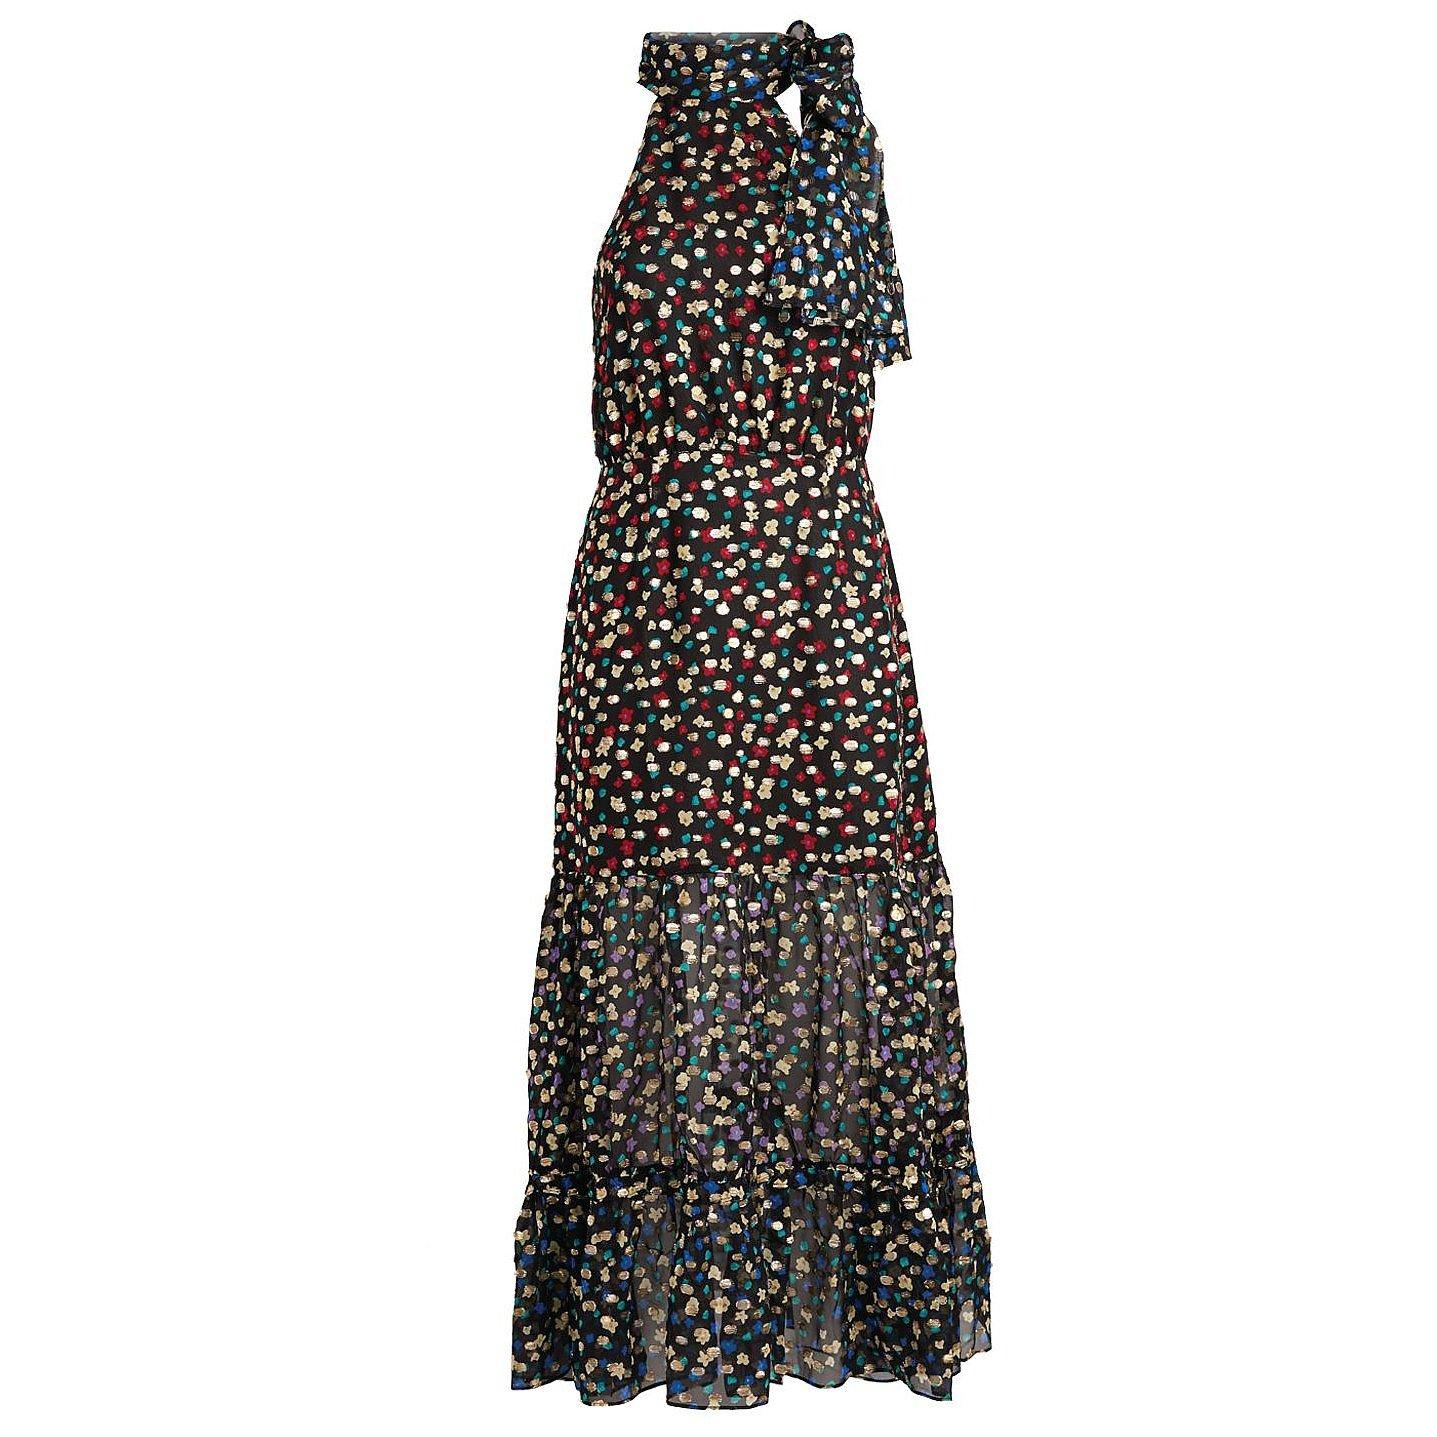 Rixo Eleanor Floral Tie-Neck Dress